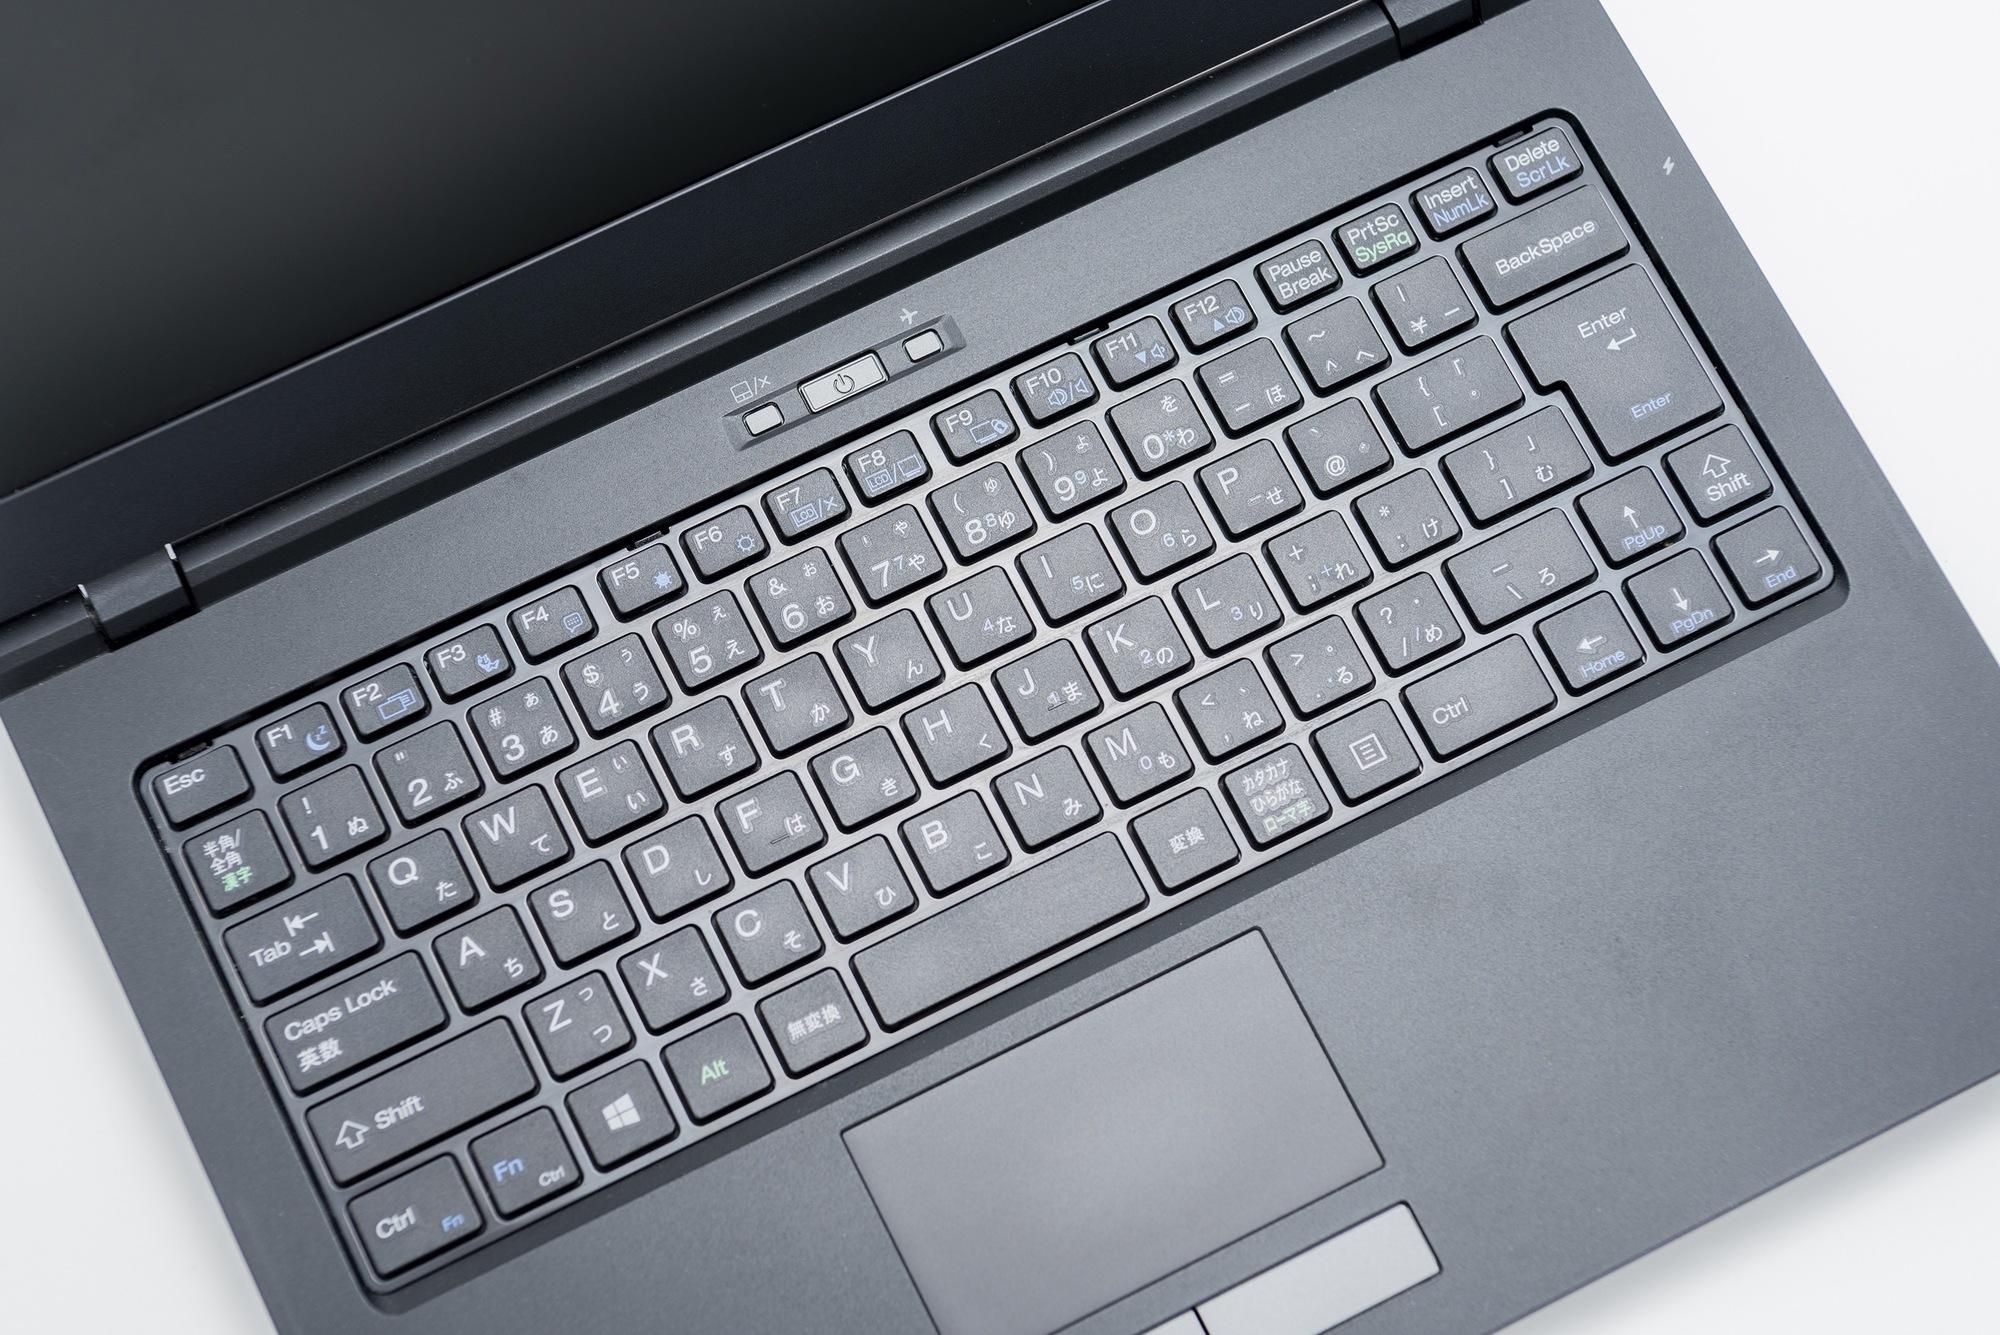 NO56・Windowsのパソコンがシャットダウンできない原因と対処法を解説